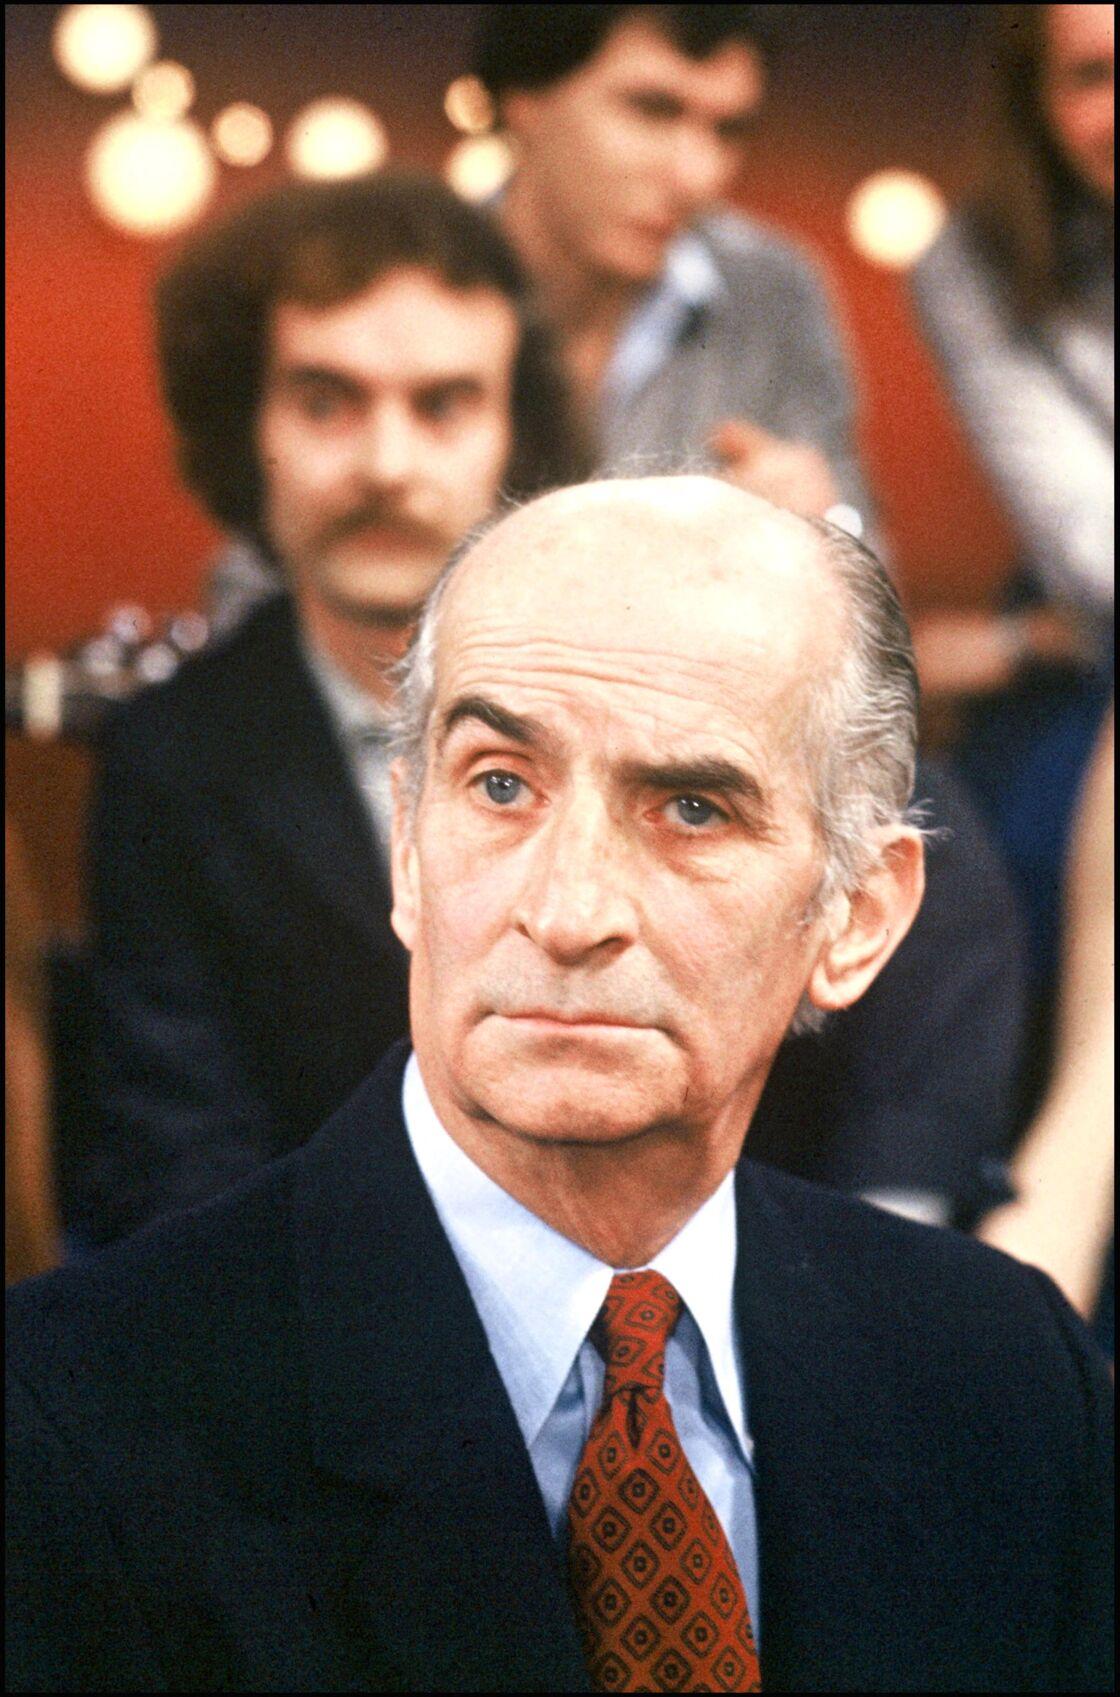 Louis de Funès en 1981